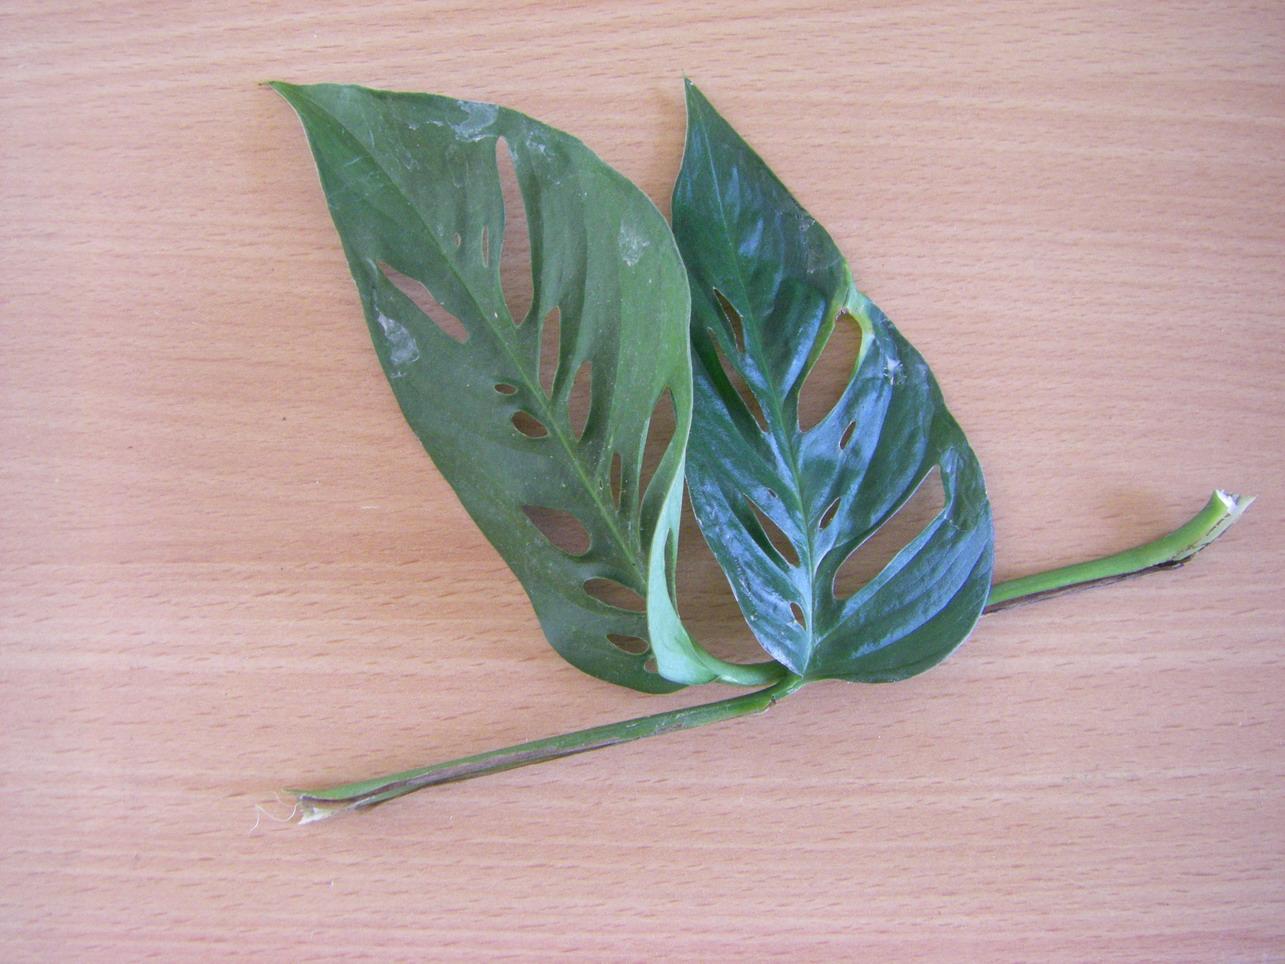 roberts pflanzenblog monstera acuminata sei du auch mal gast. Black Bedroom Furniture Sets. Home Design Ideas